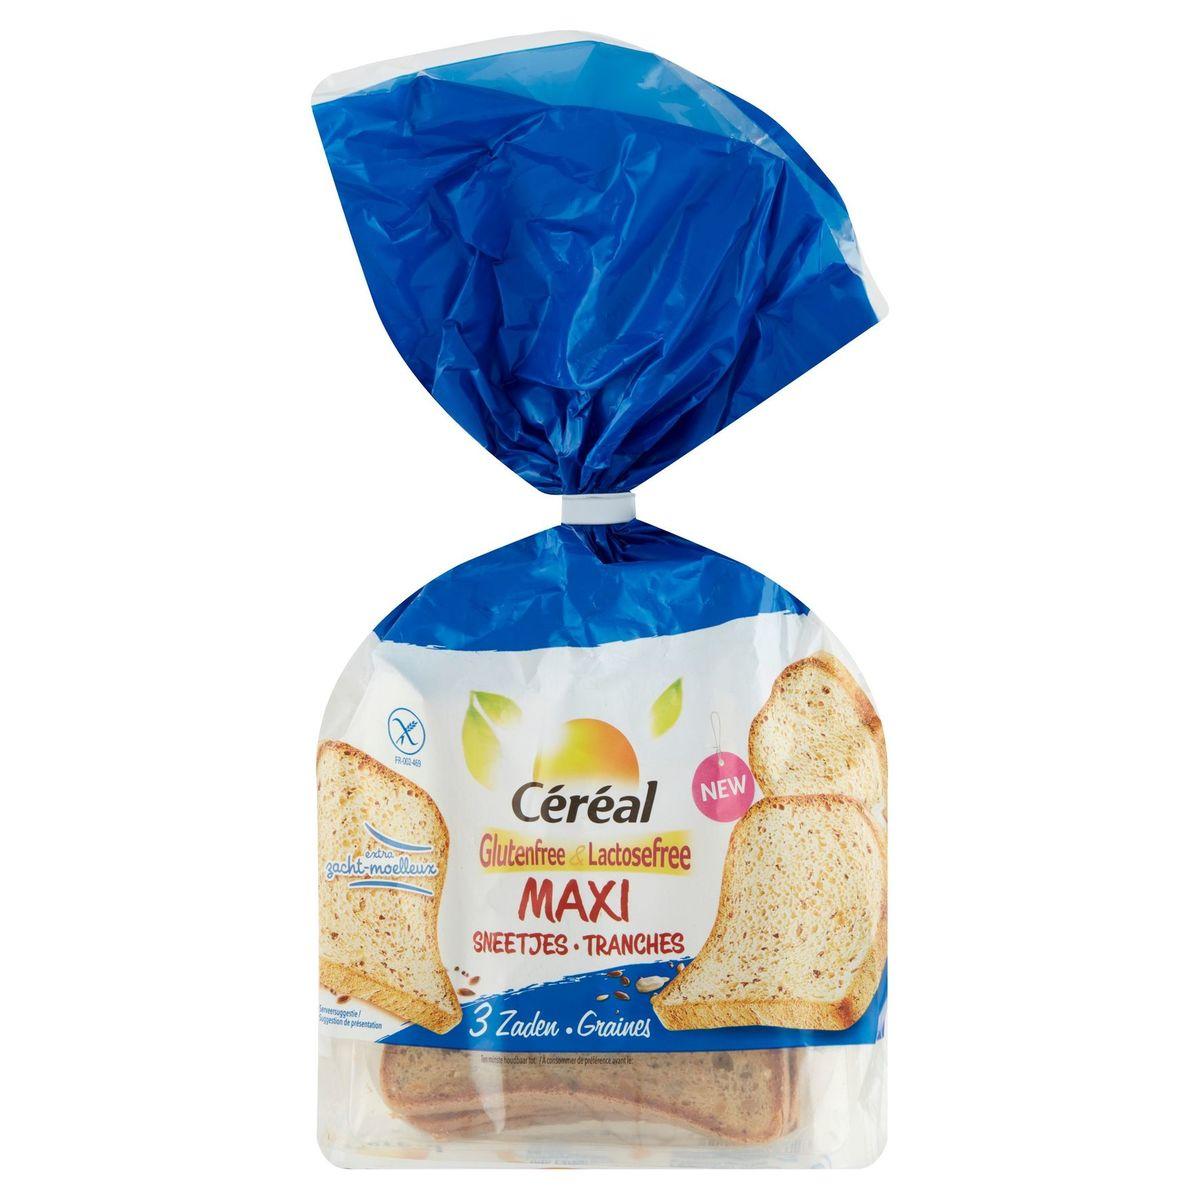 Céréal Glutenfree & Lactosefree Maxi Tranches 3 Graines 7 Pièces 350 g